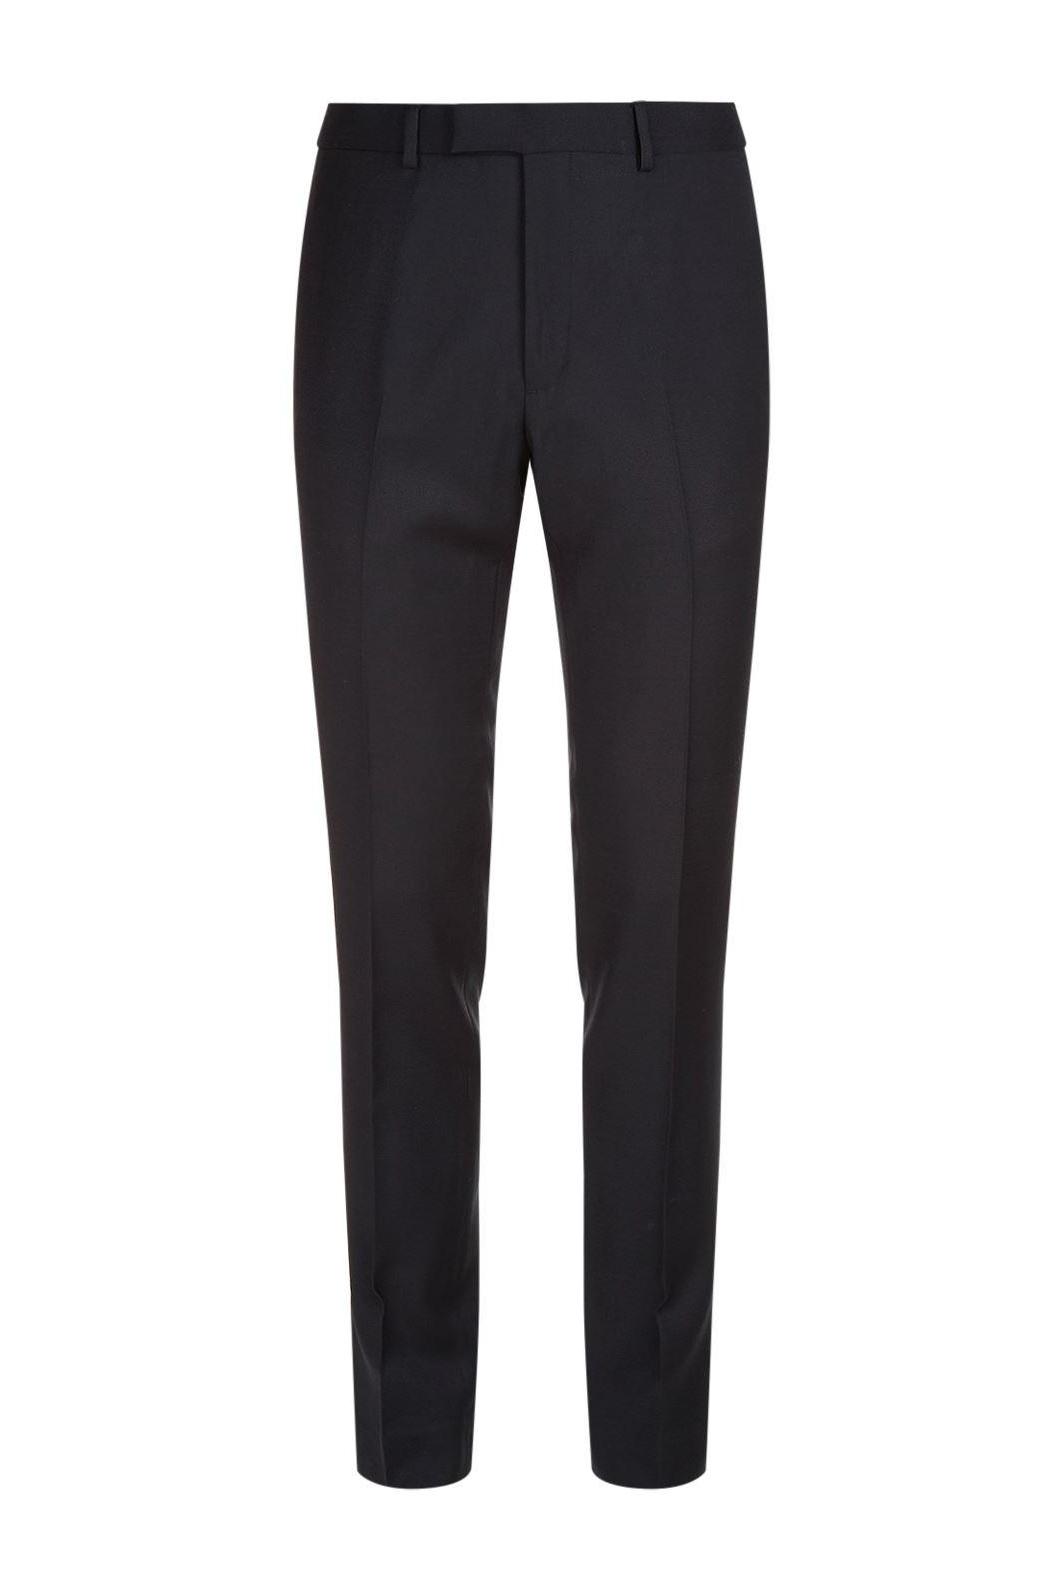 Sandro Paris - Navy Pique Trousers.jpg